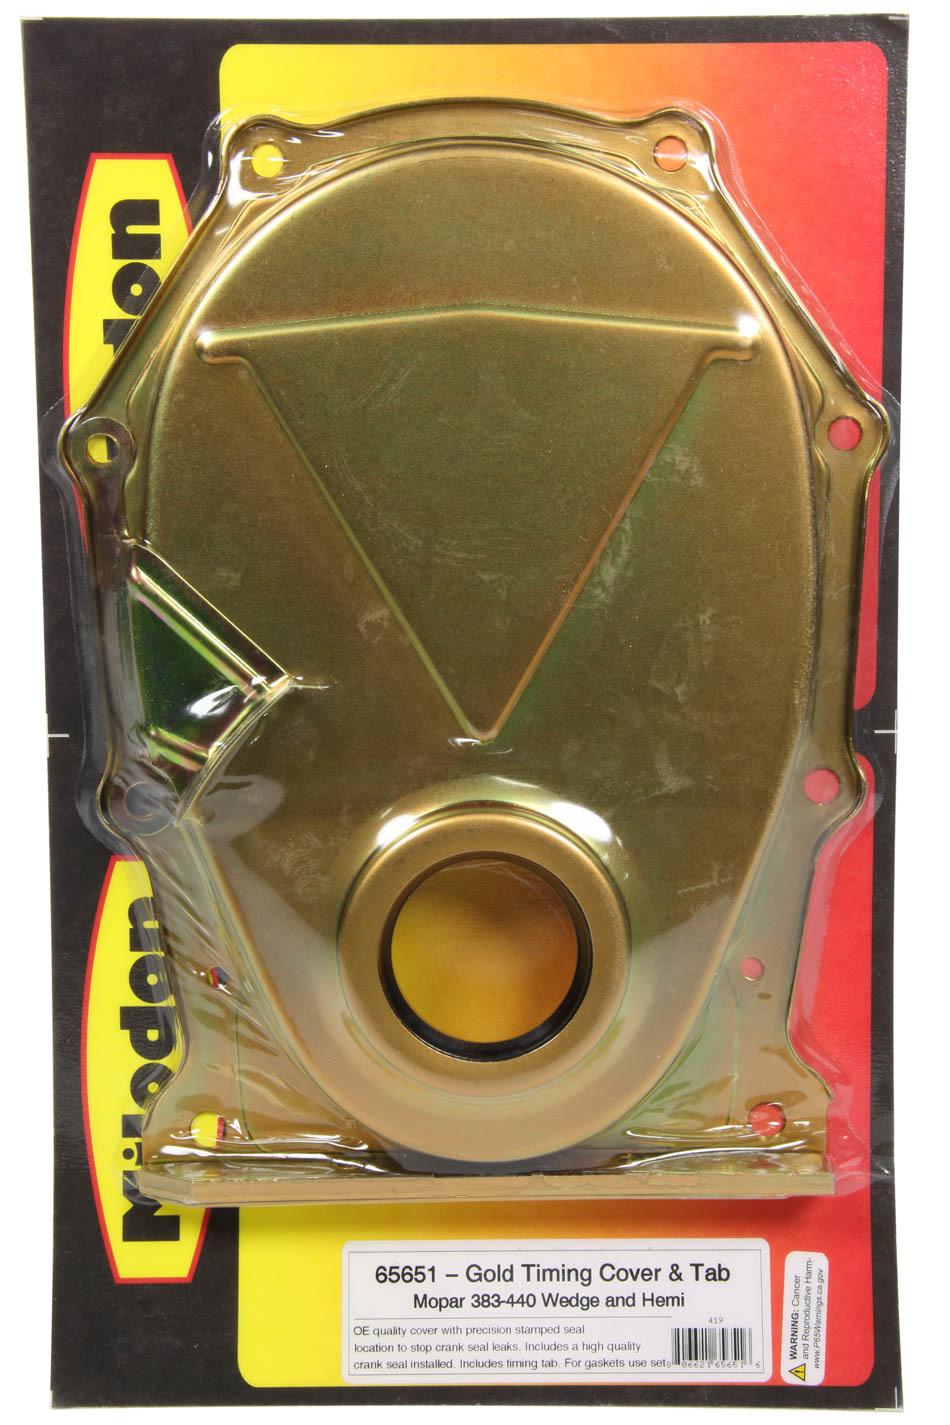 Milodon 65651 Timing Cover, 1 Piece, Seal / Timing Tab Included, Steel, Cadmium, Mopar B / RB-Series / Hemi, Kit